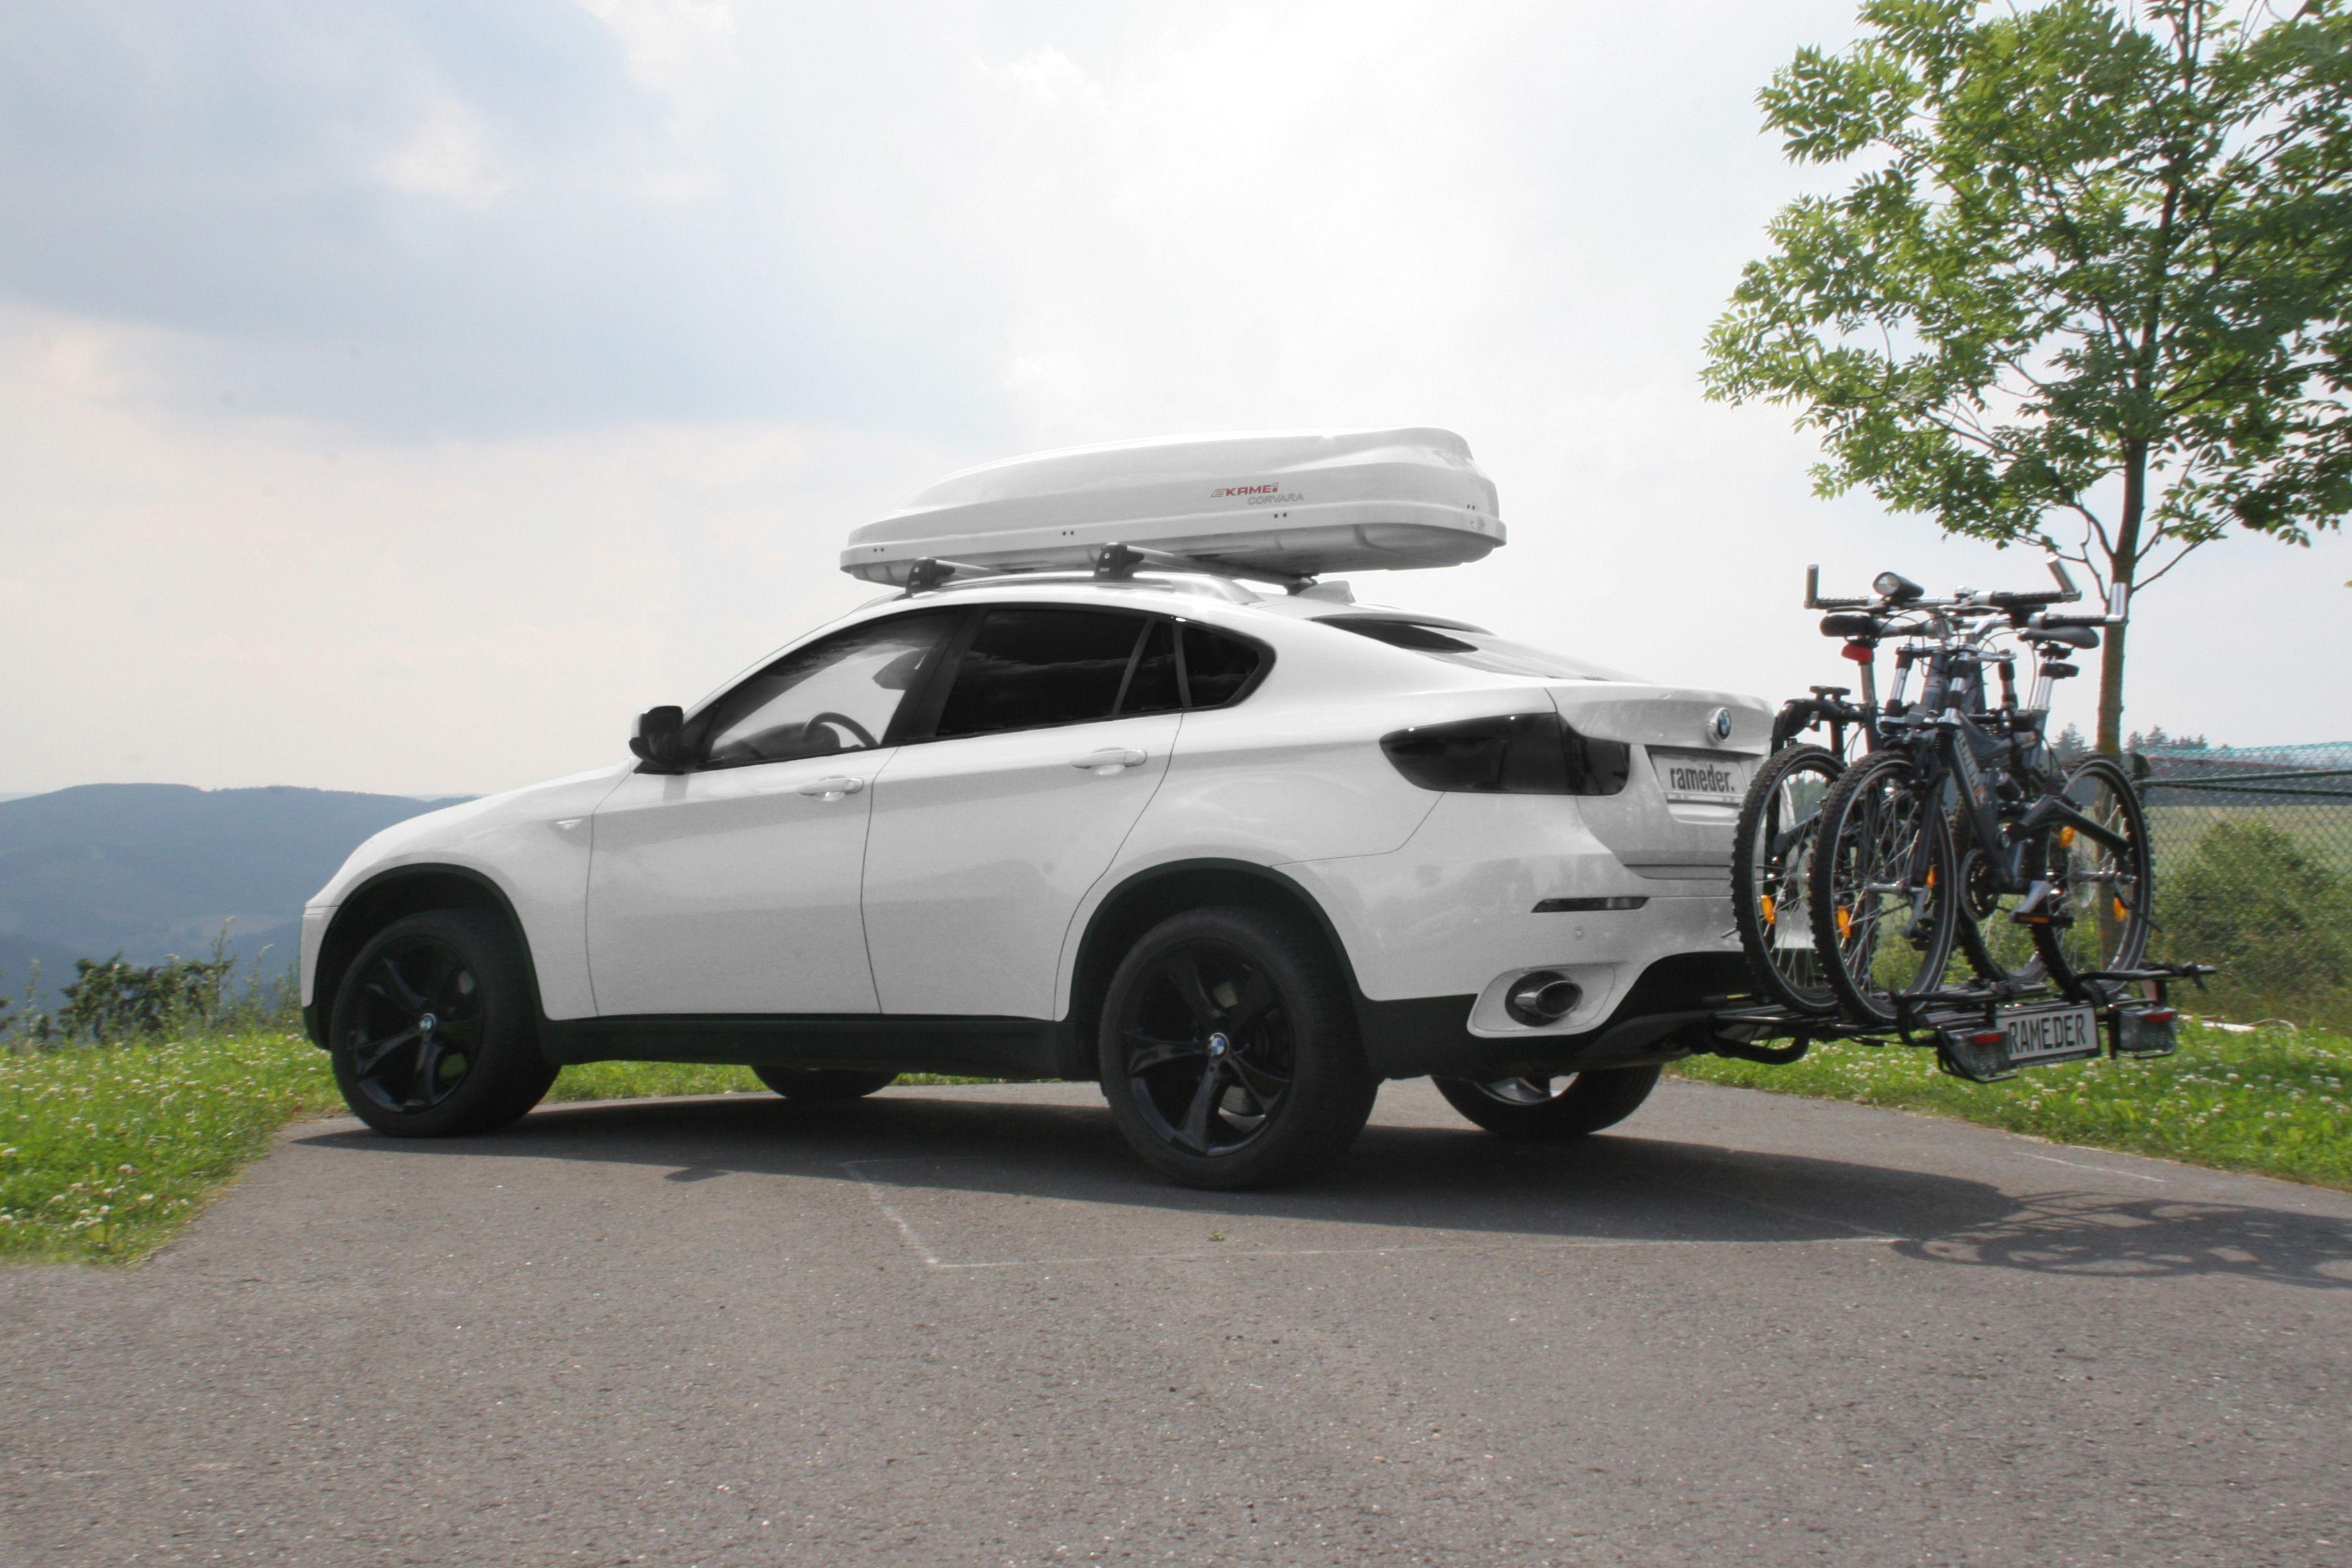 bmw x6 mit anh ngerkupplung fahrradtr ger und dachbox bmw x6 with towbar bike carrier and roof. Black Bedroom Furniture Sets. Home Design Ideas